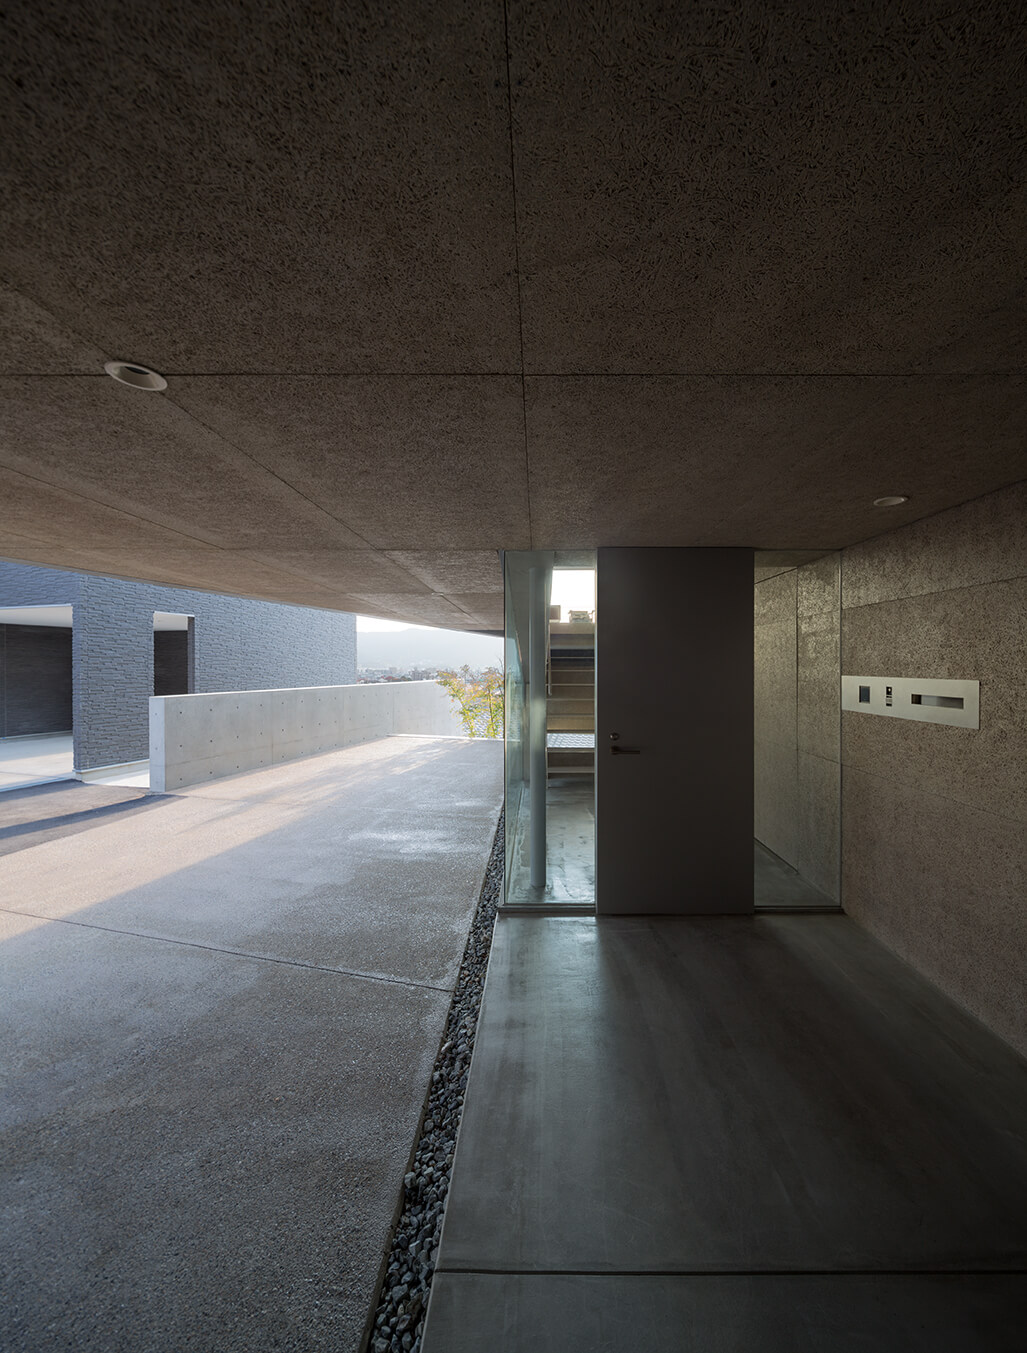 『大池の住宅』-福岡県福岡市-建築写真・竣工写真・インテリア写真3